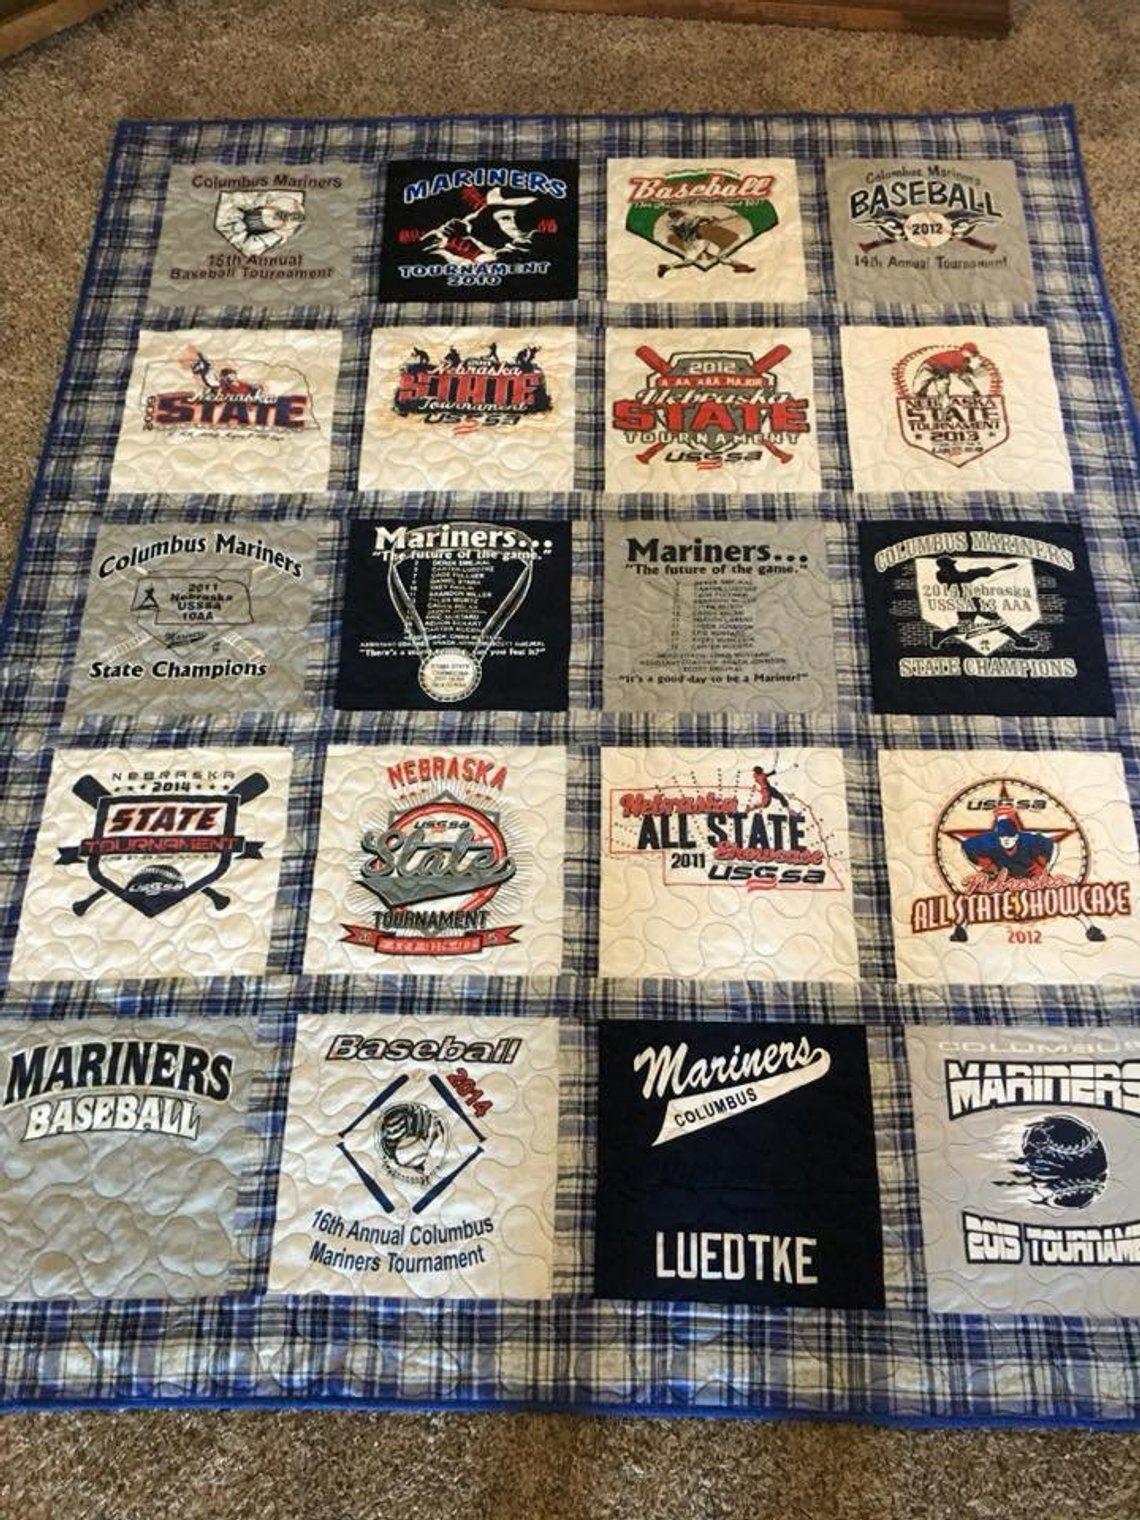 T shirt quilt-Tee shirt quilt-T-shirt quilt-T shirt blanket-T-shirt quilts-custom Tshirt quilt-Jersey quilt-Tee shirt blanket-DEPOSIT ONLY!